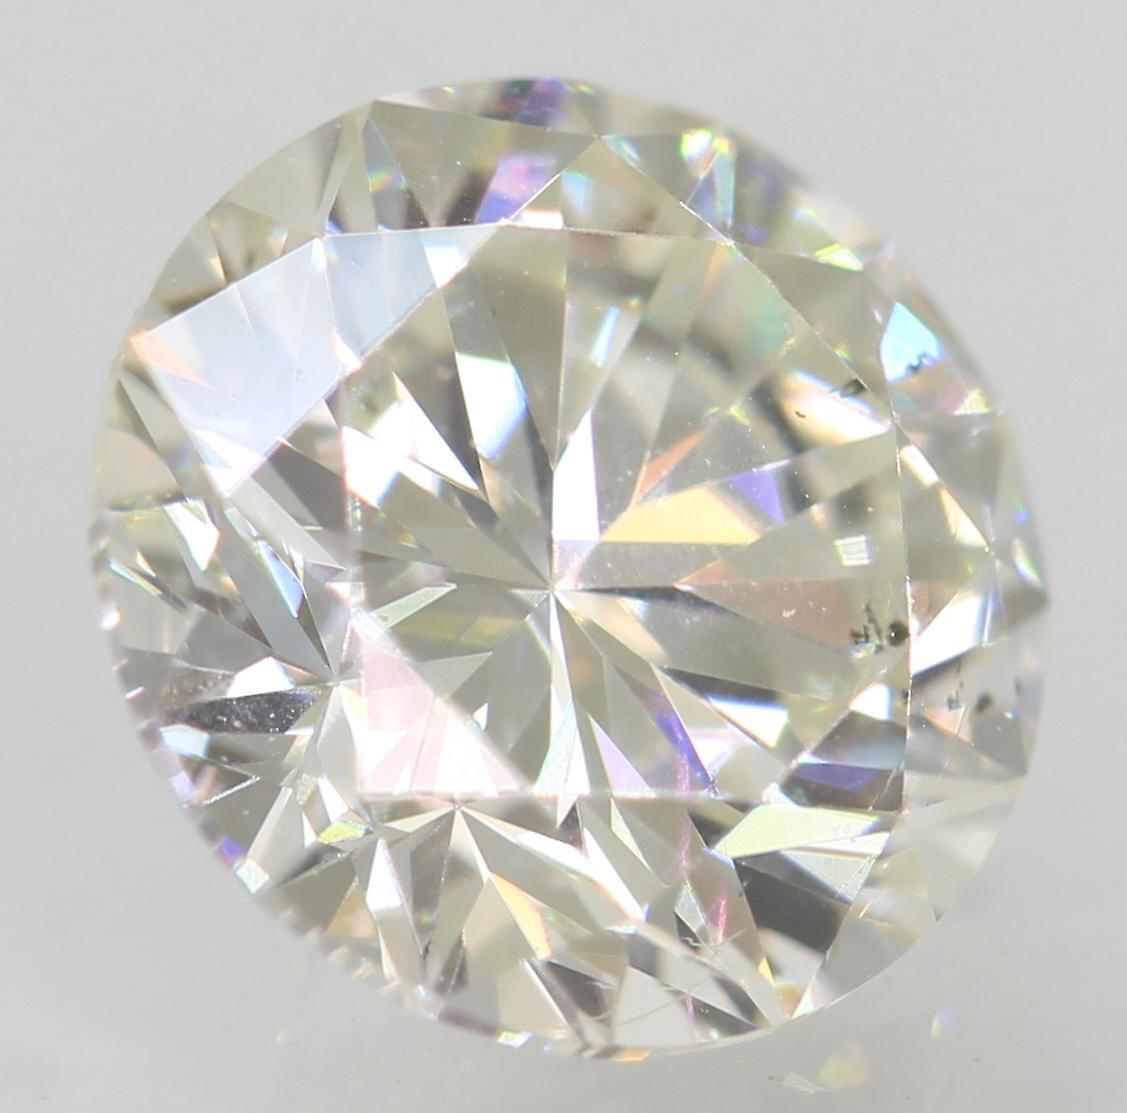 Certified 1.04 Carat G VVS2 Round Brilliant Enhanced Natural Loose Diamond 6.49m